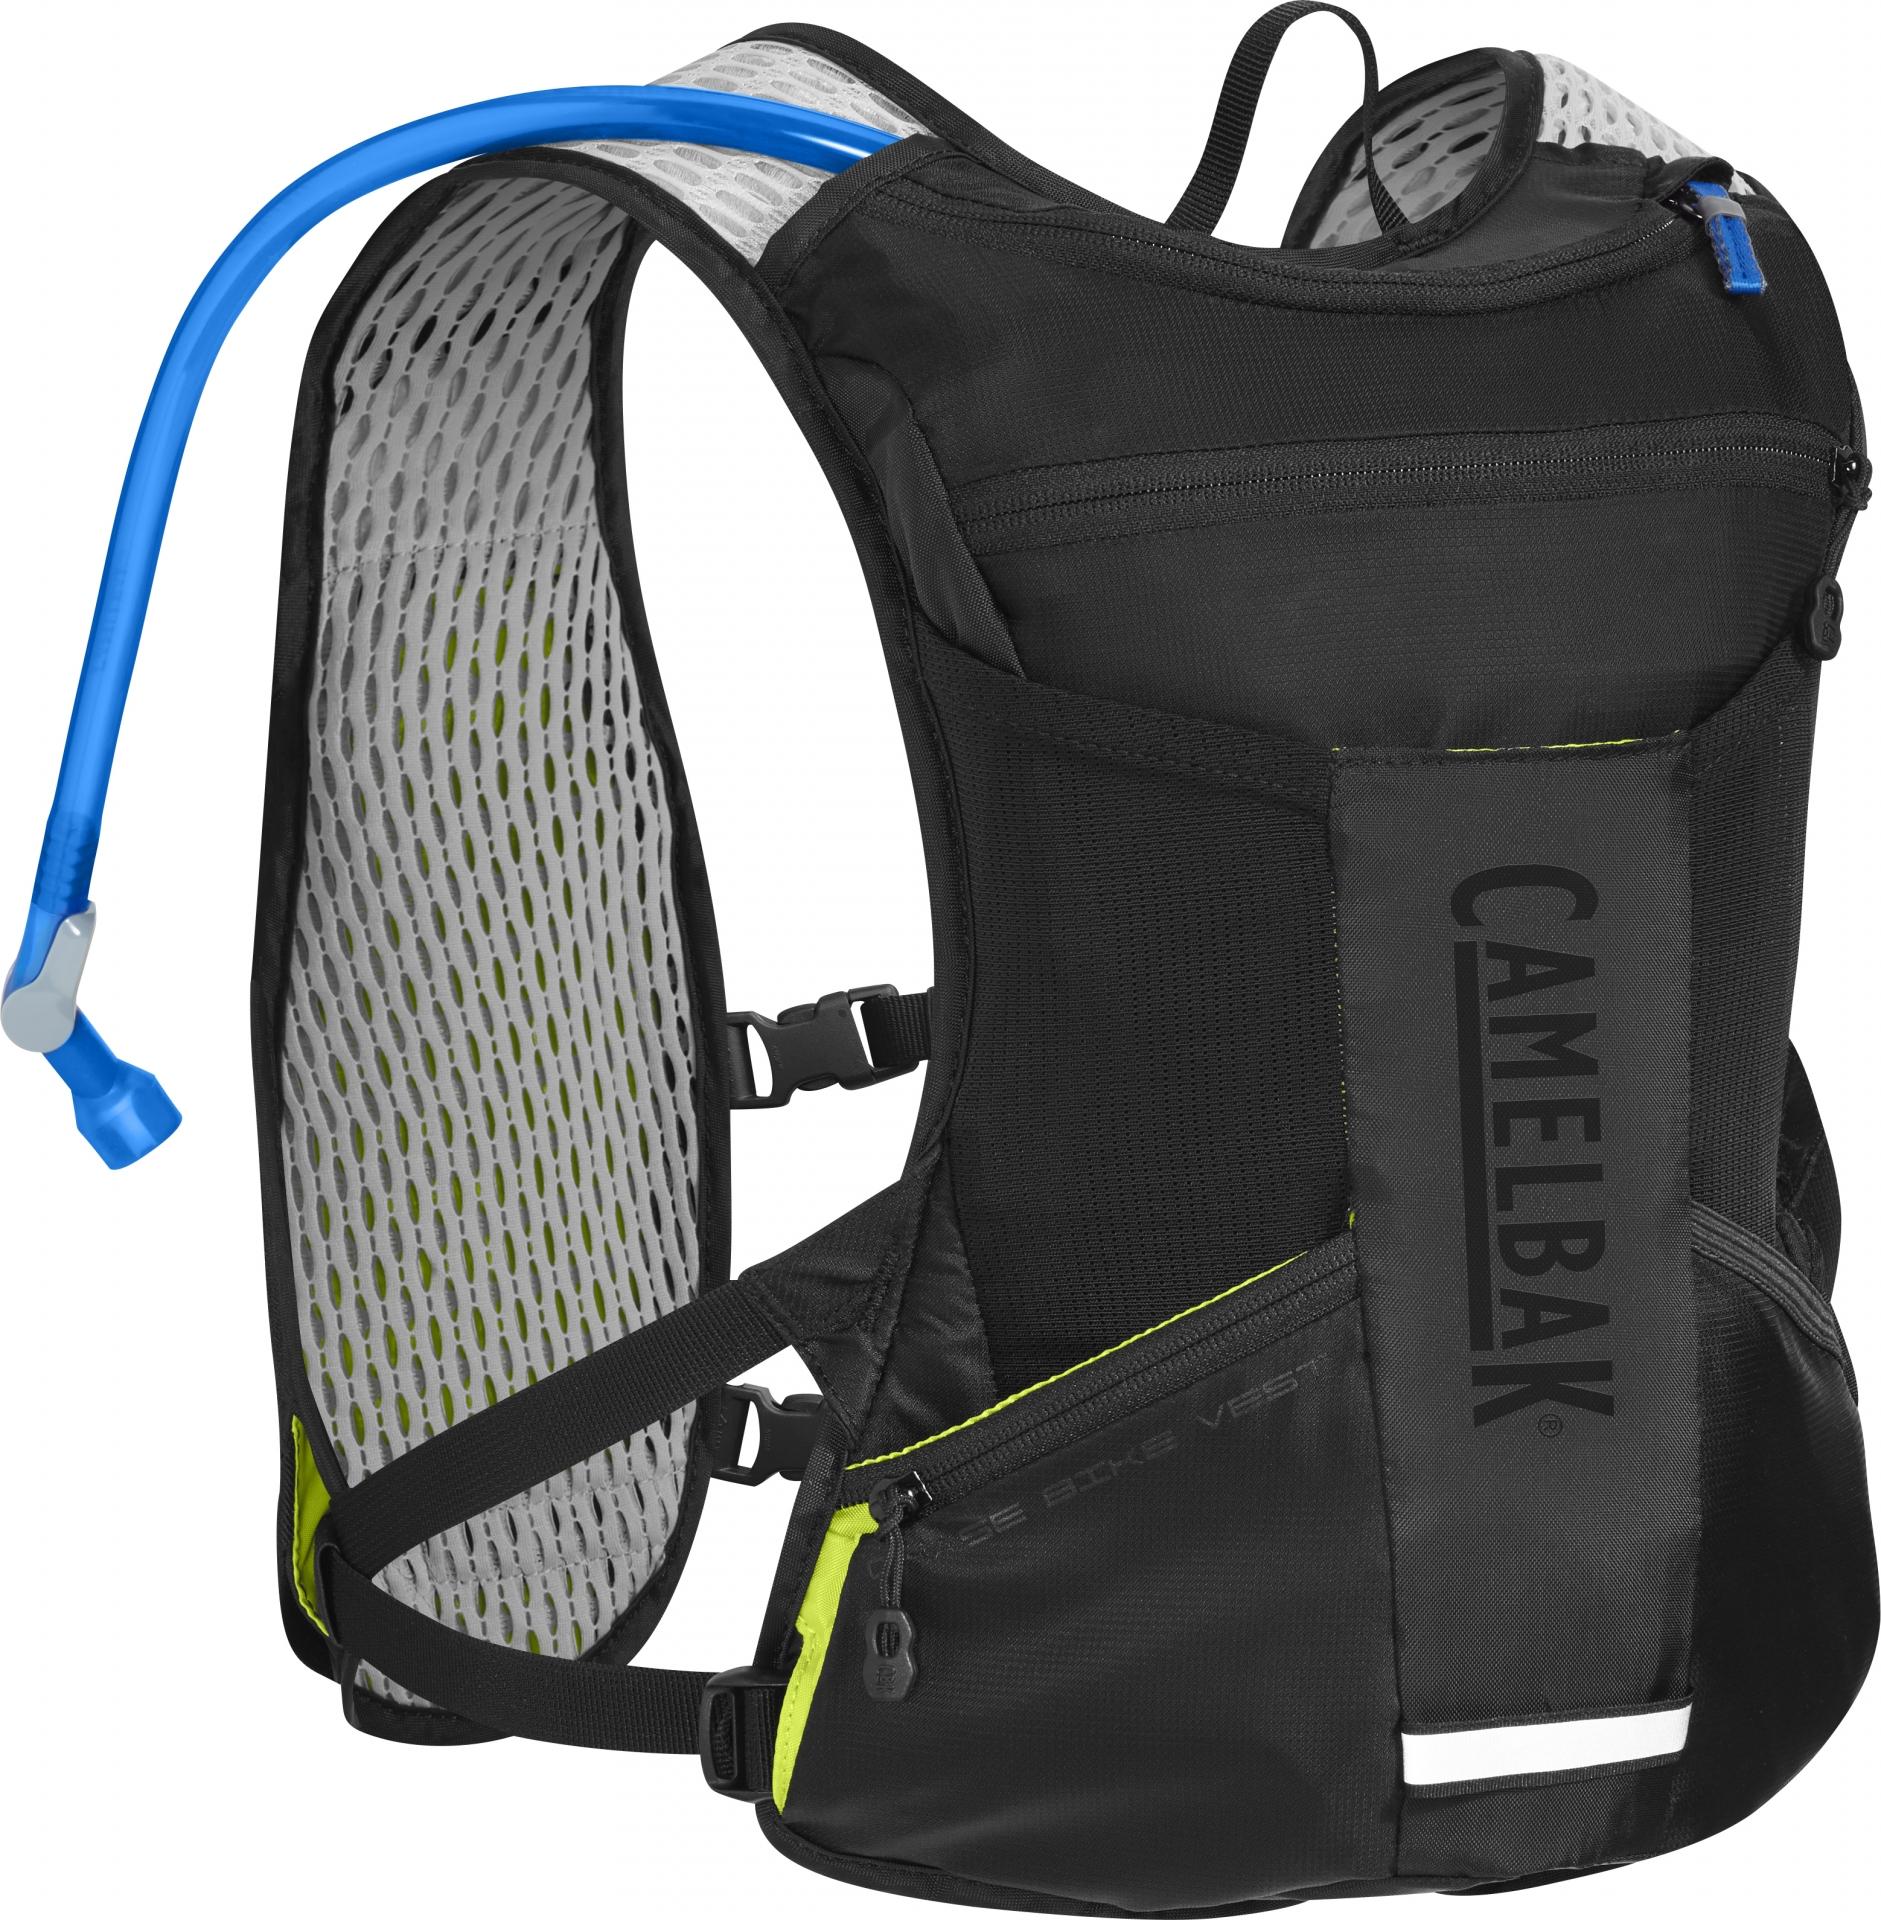 Gilet dhydratation CamelBak Chase Bike Vest 2,5 L Noir